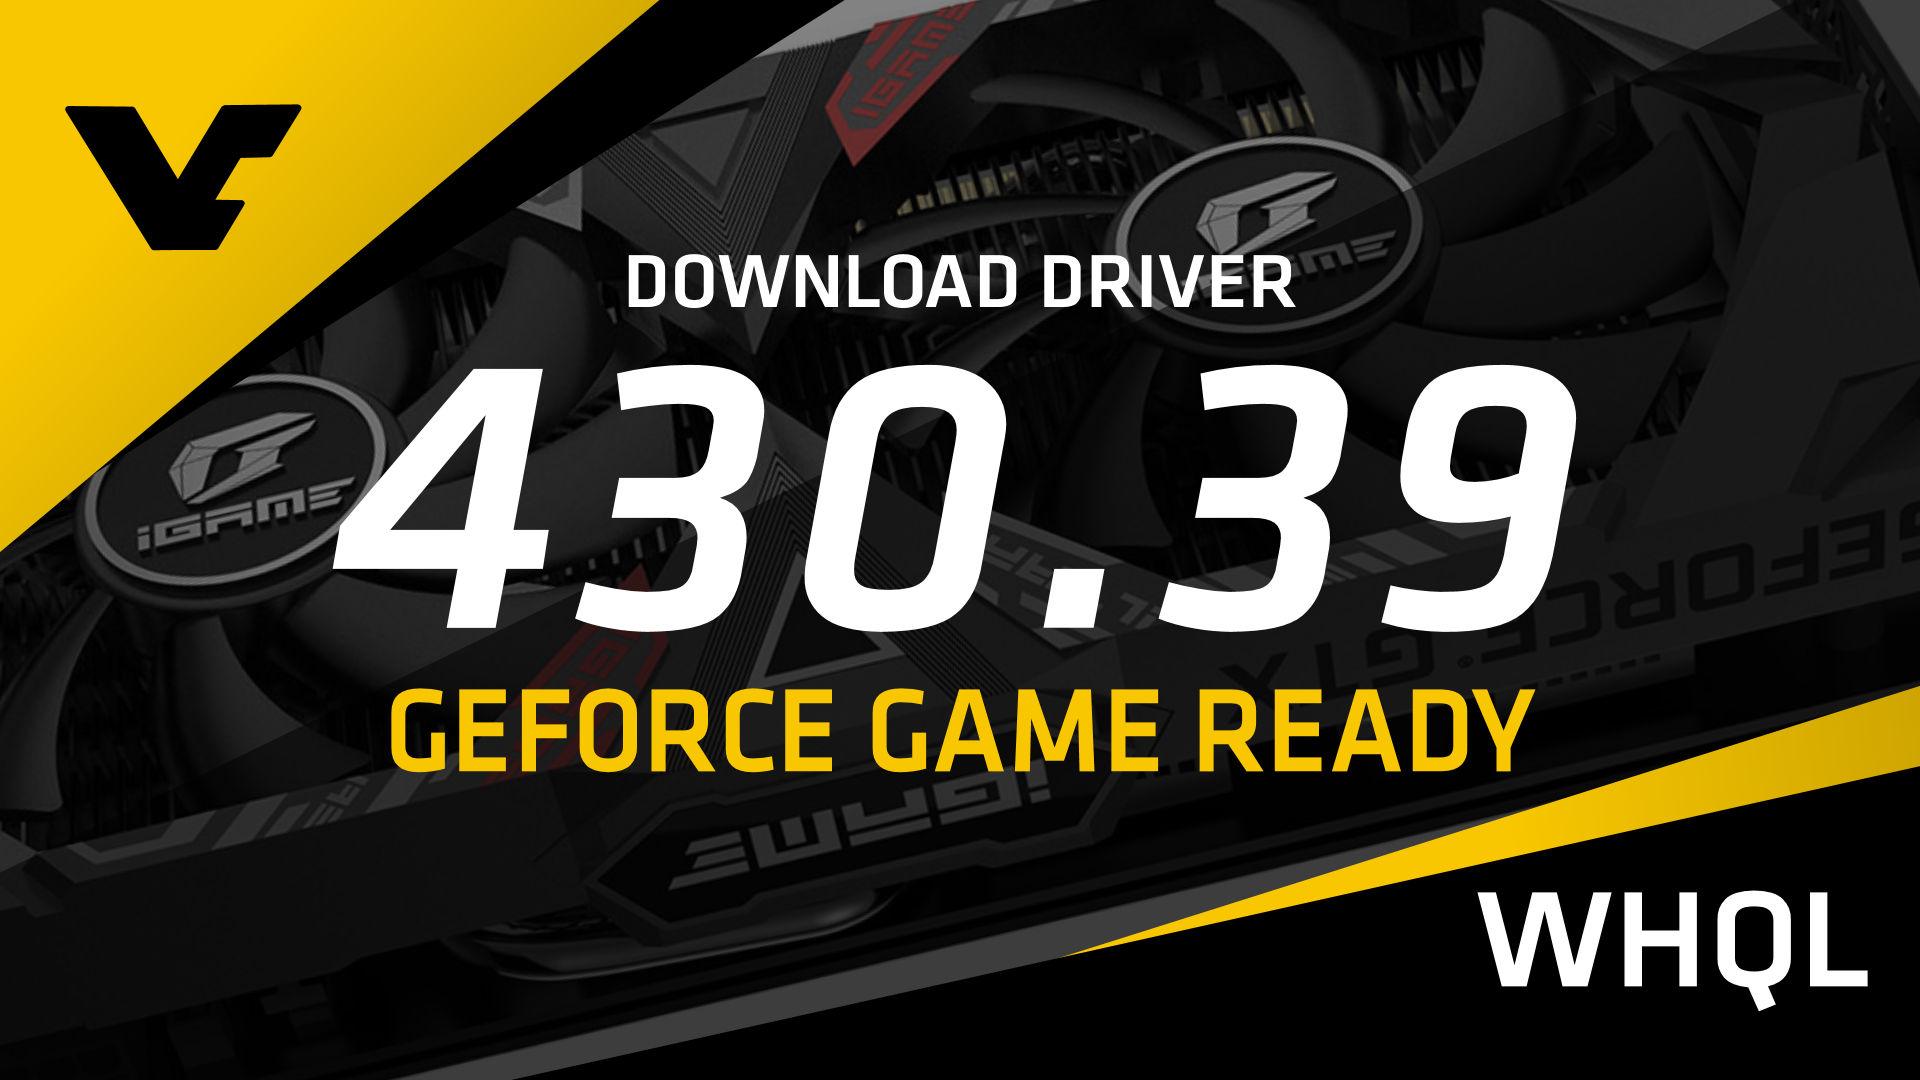 NVIDIA GeForce Game Ready 430 39 WHQL - VideoCardz com